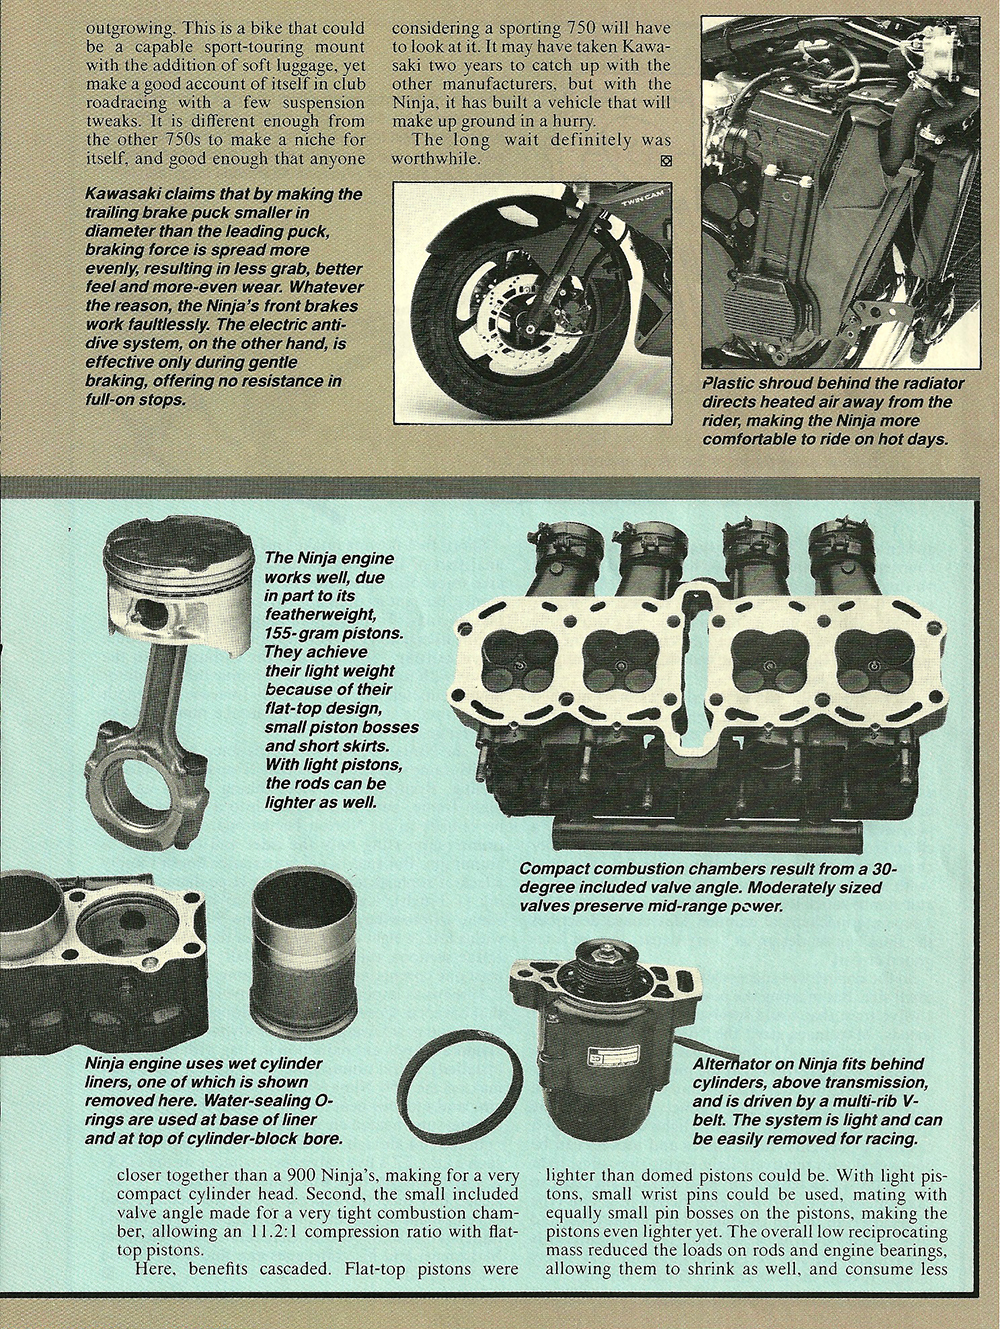 1986 Kawasaki Ninja 750R road test 04.jpg